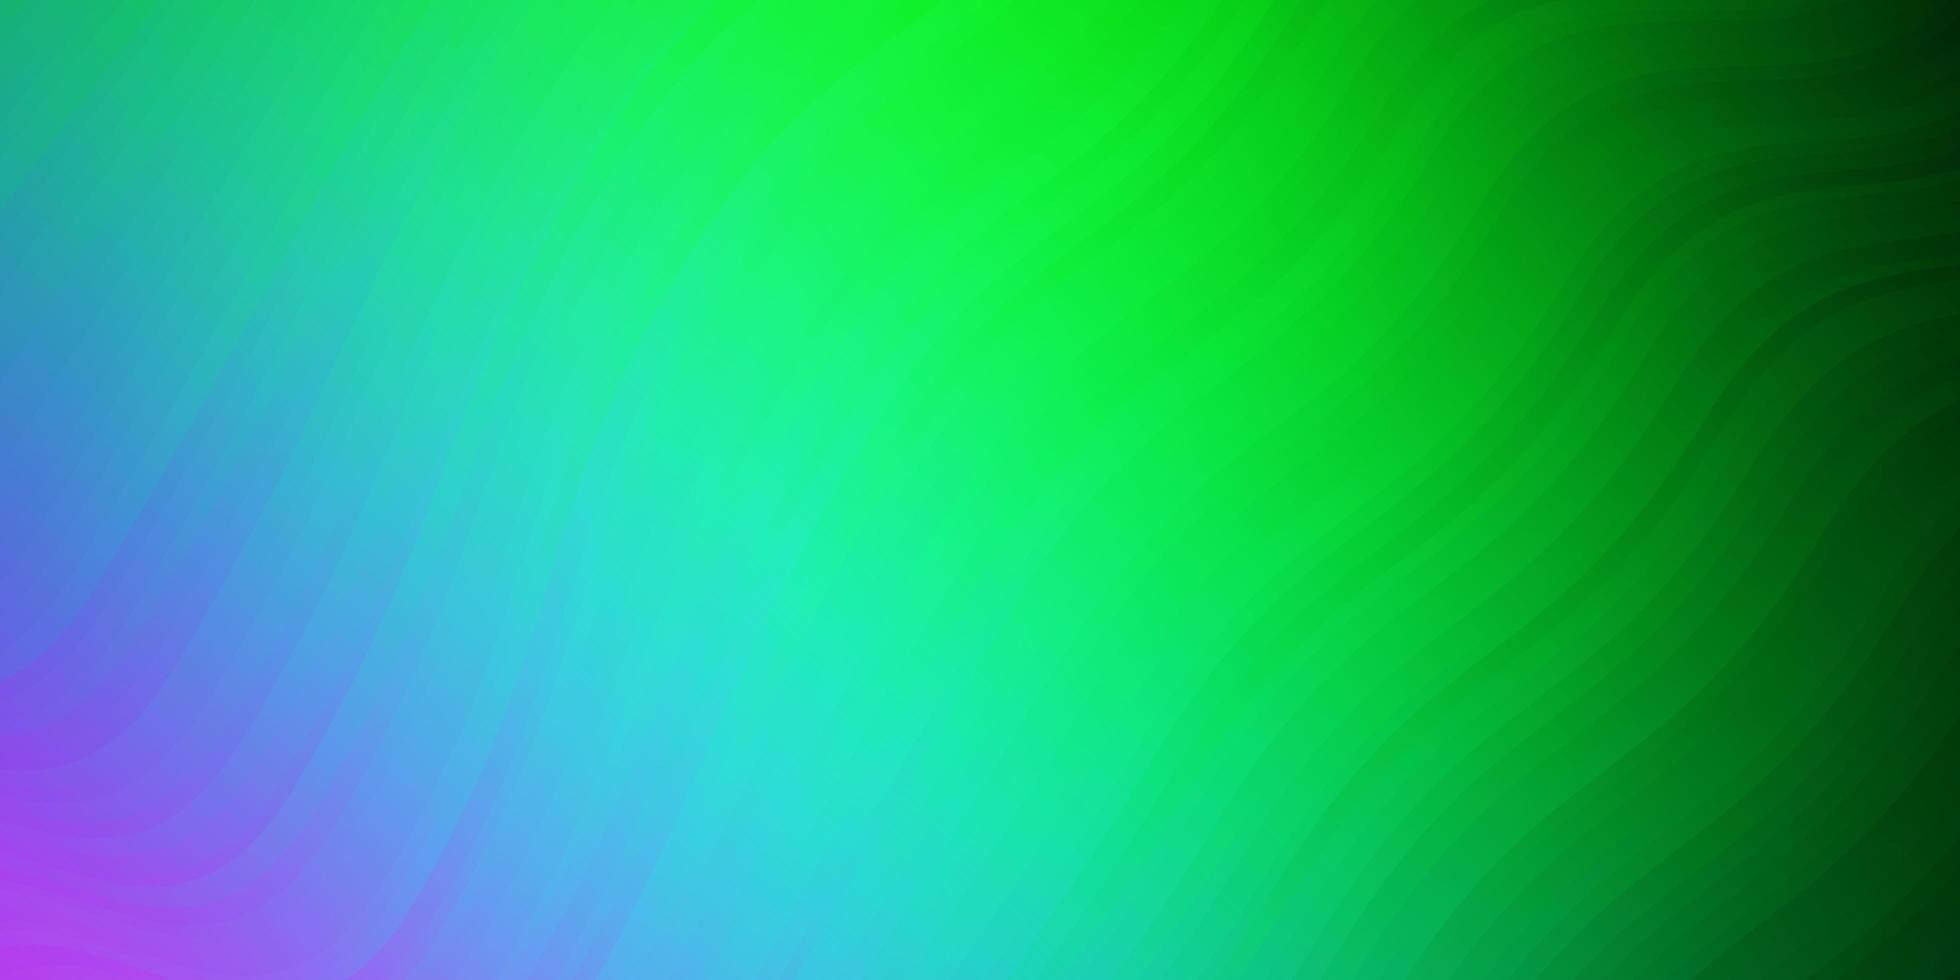 hellrosa, grüne Vektorschablone mit Kurven vektor